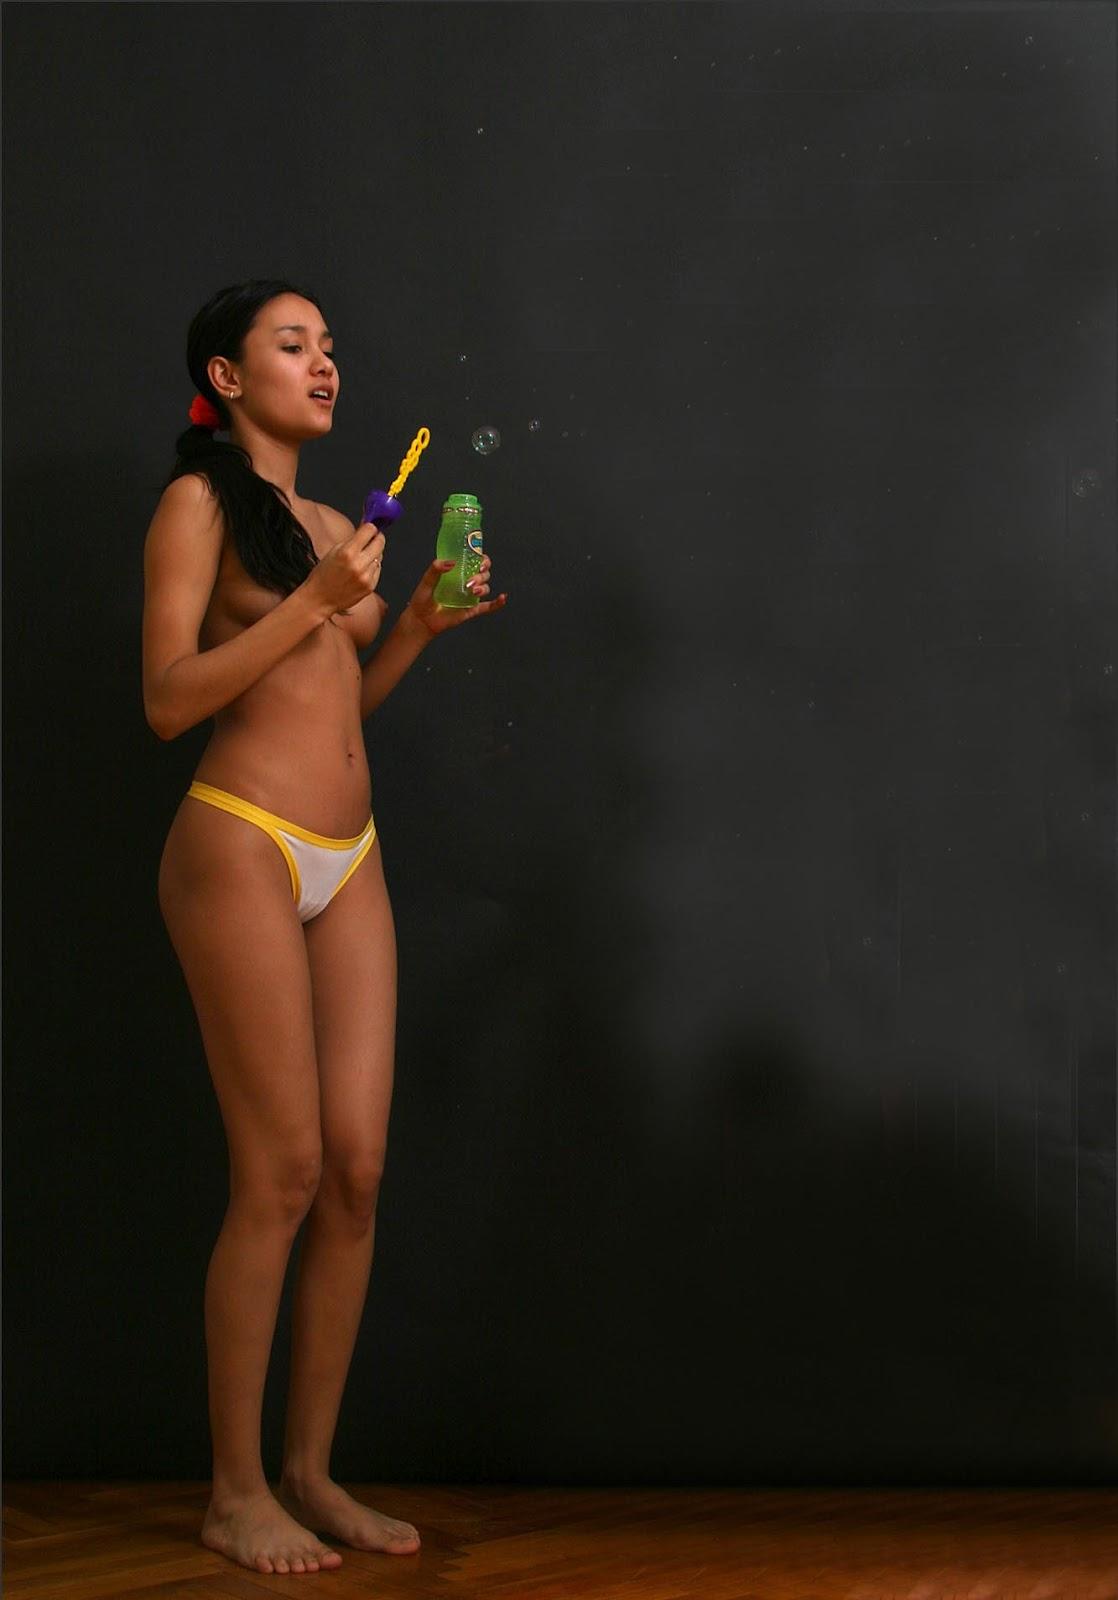 Magdalena porn star